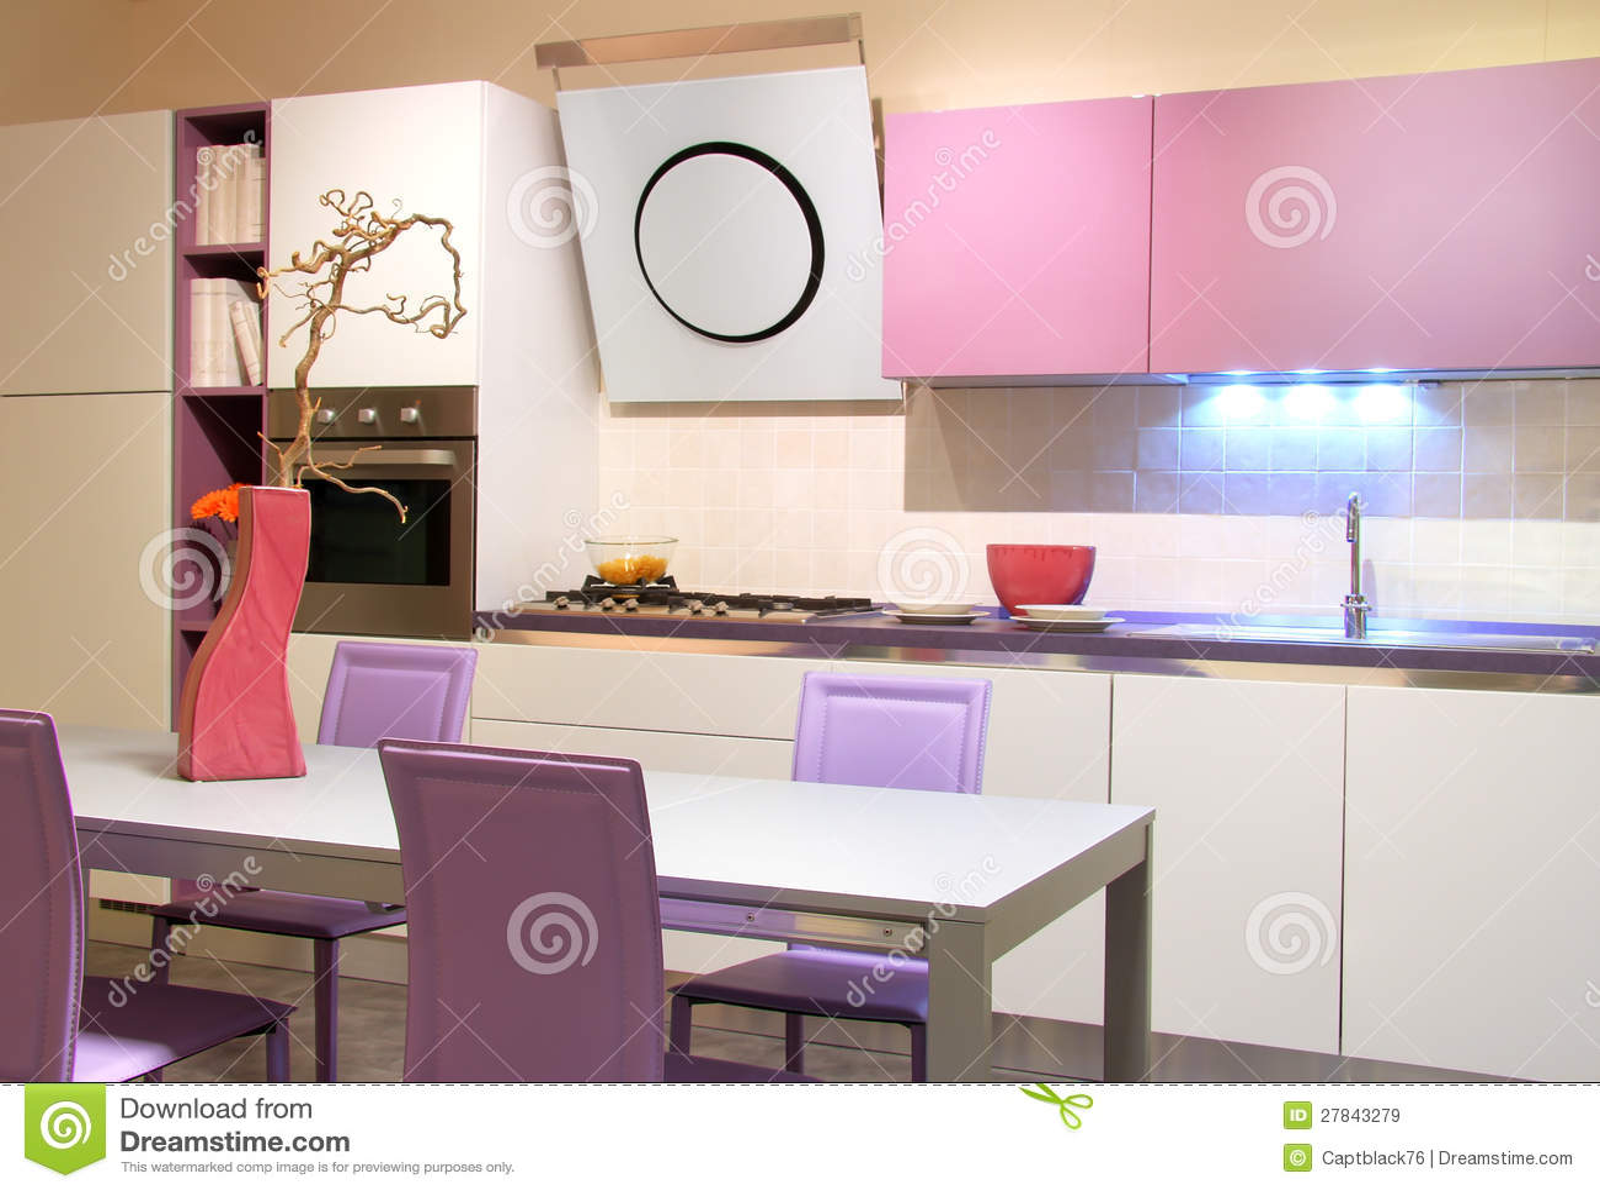 Free Kitchen Design Program